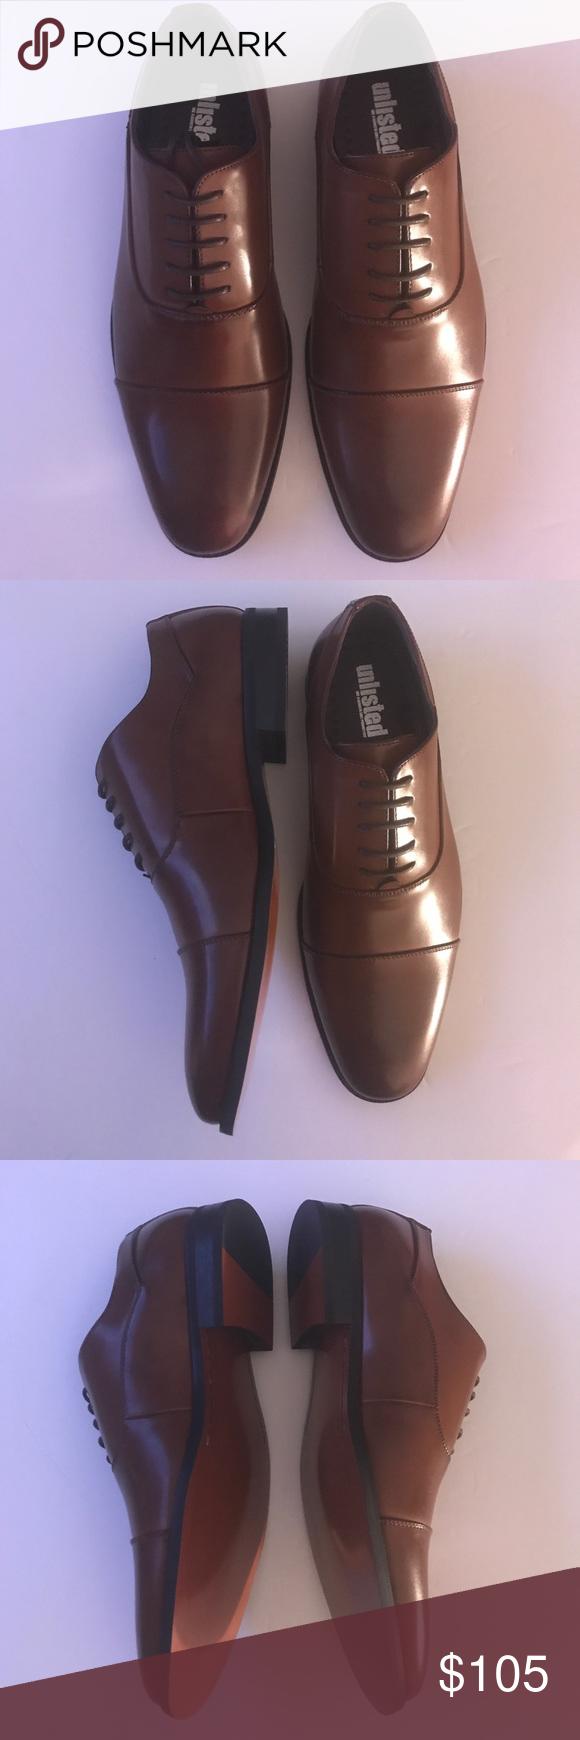 9d0c1b6719752 New Kenneth Cole Oxford lace up men s shoes 9.5 M